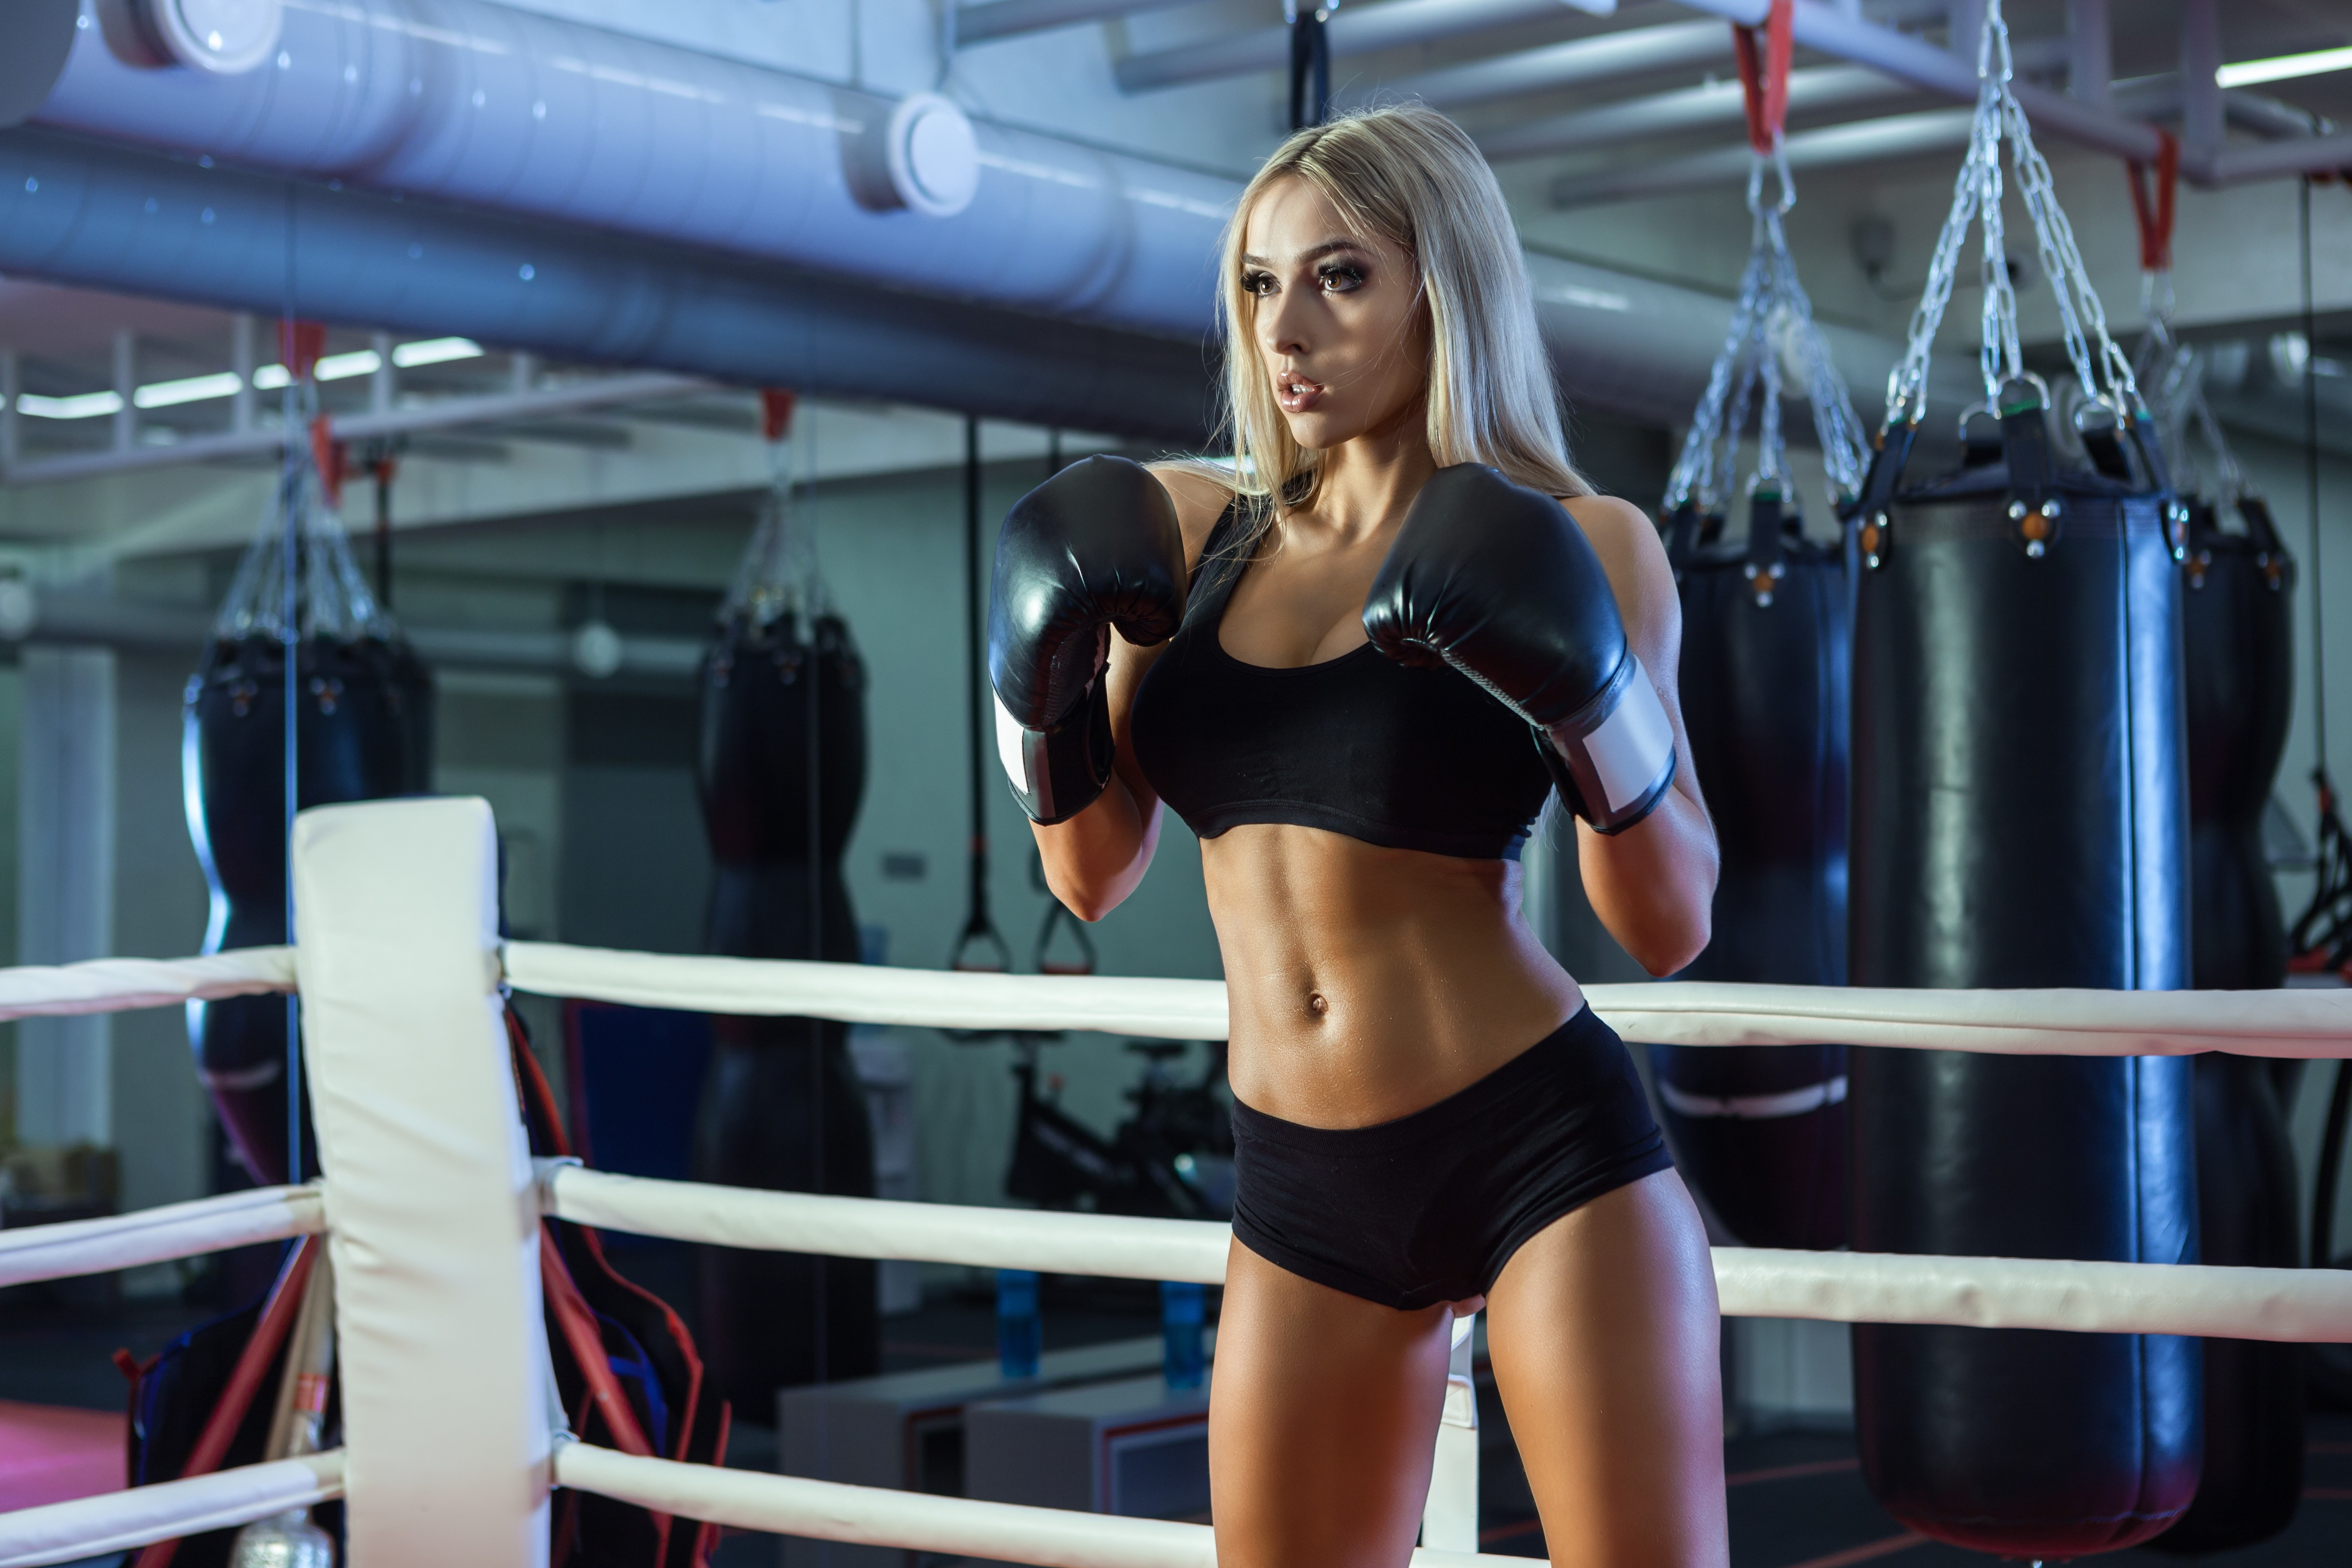 People 5616x3744 boxing gloves boxing blonde sport  sports women Stas Tolstnev Nastya Ferz curvy long hair sport bras black gloves gloves fitness model